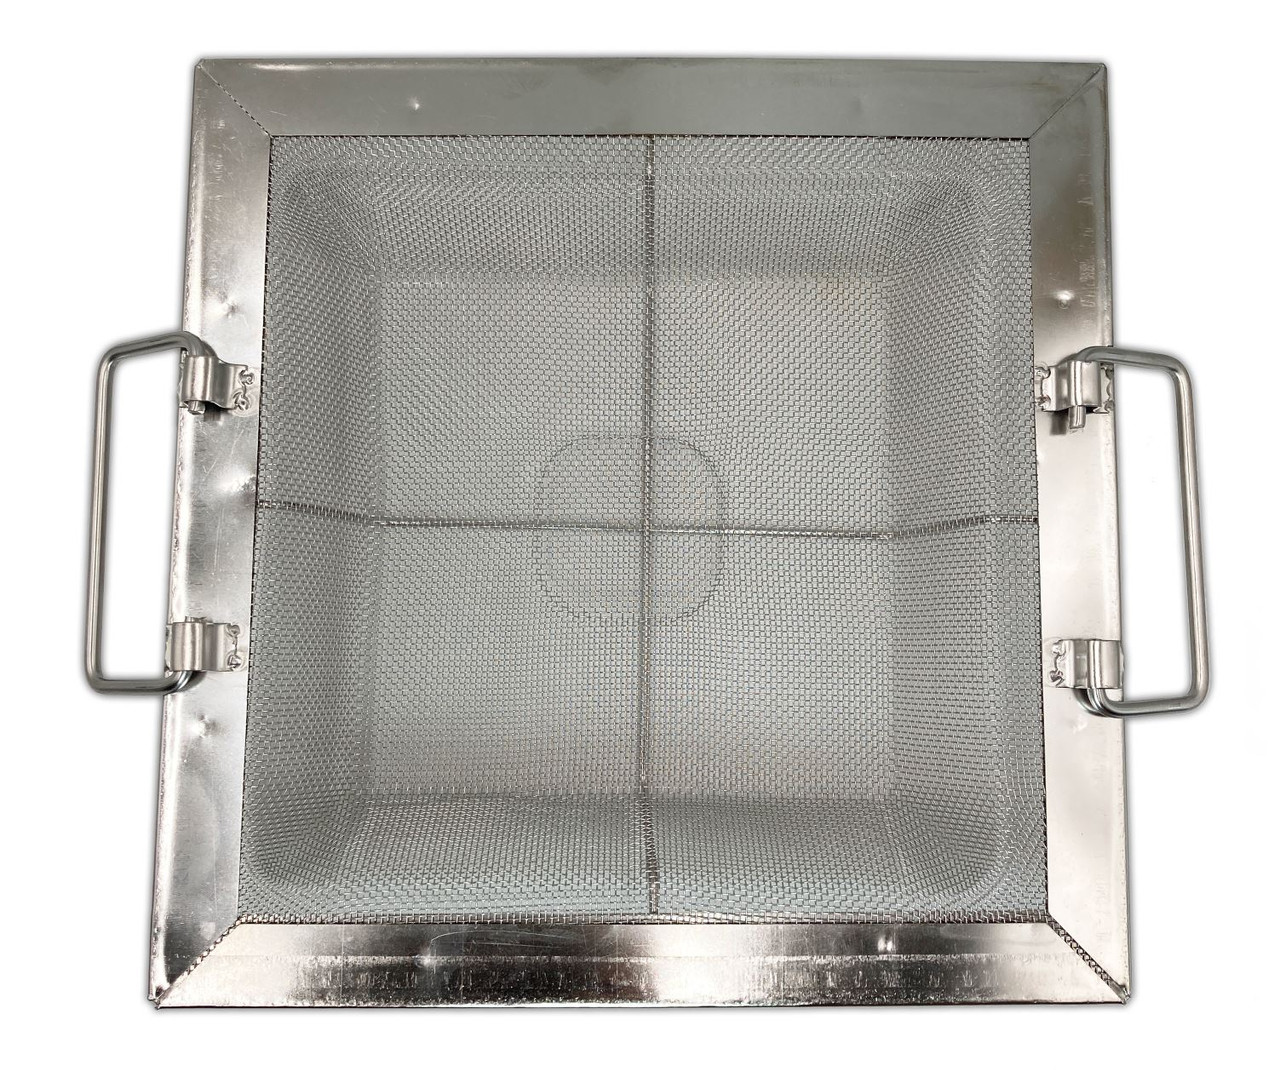 Stainless Steel Mesh Drain Basket, SFL-10